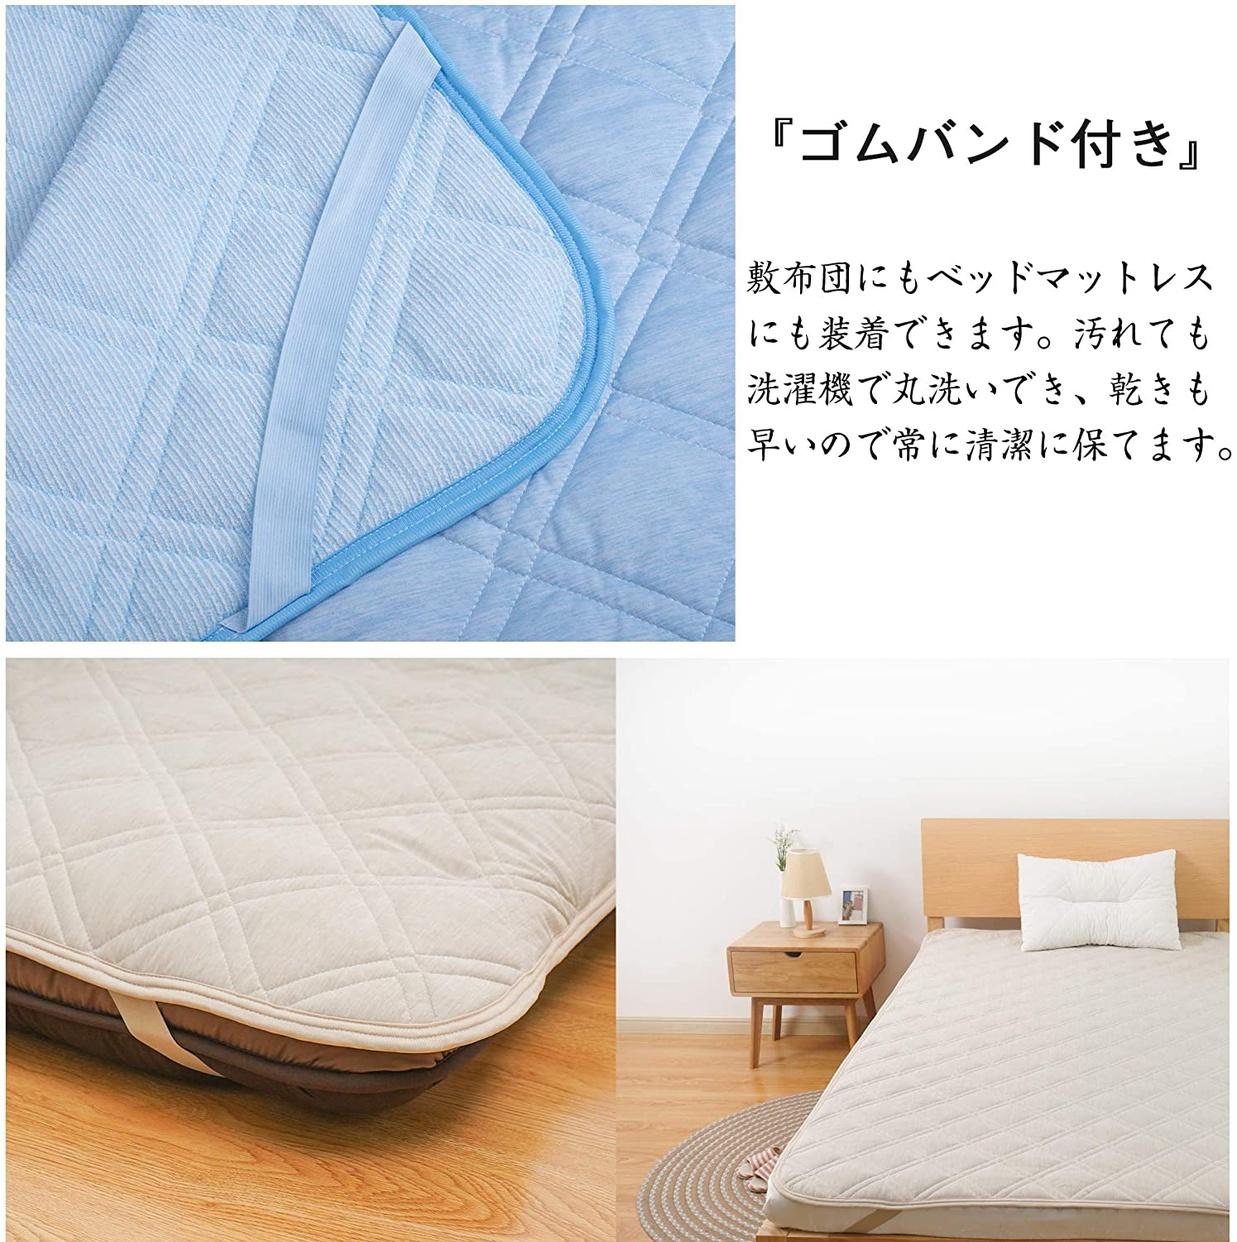 mensu(メンス) ひんやり 敷きパッドの商品画像6